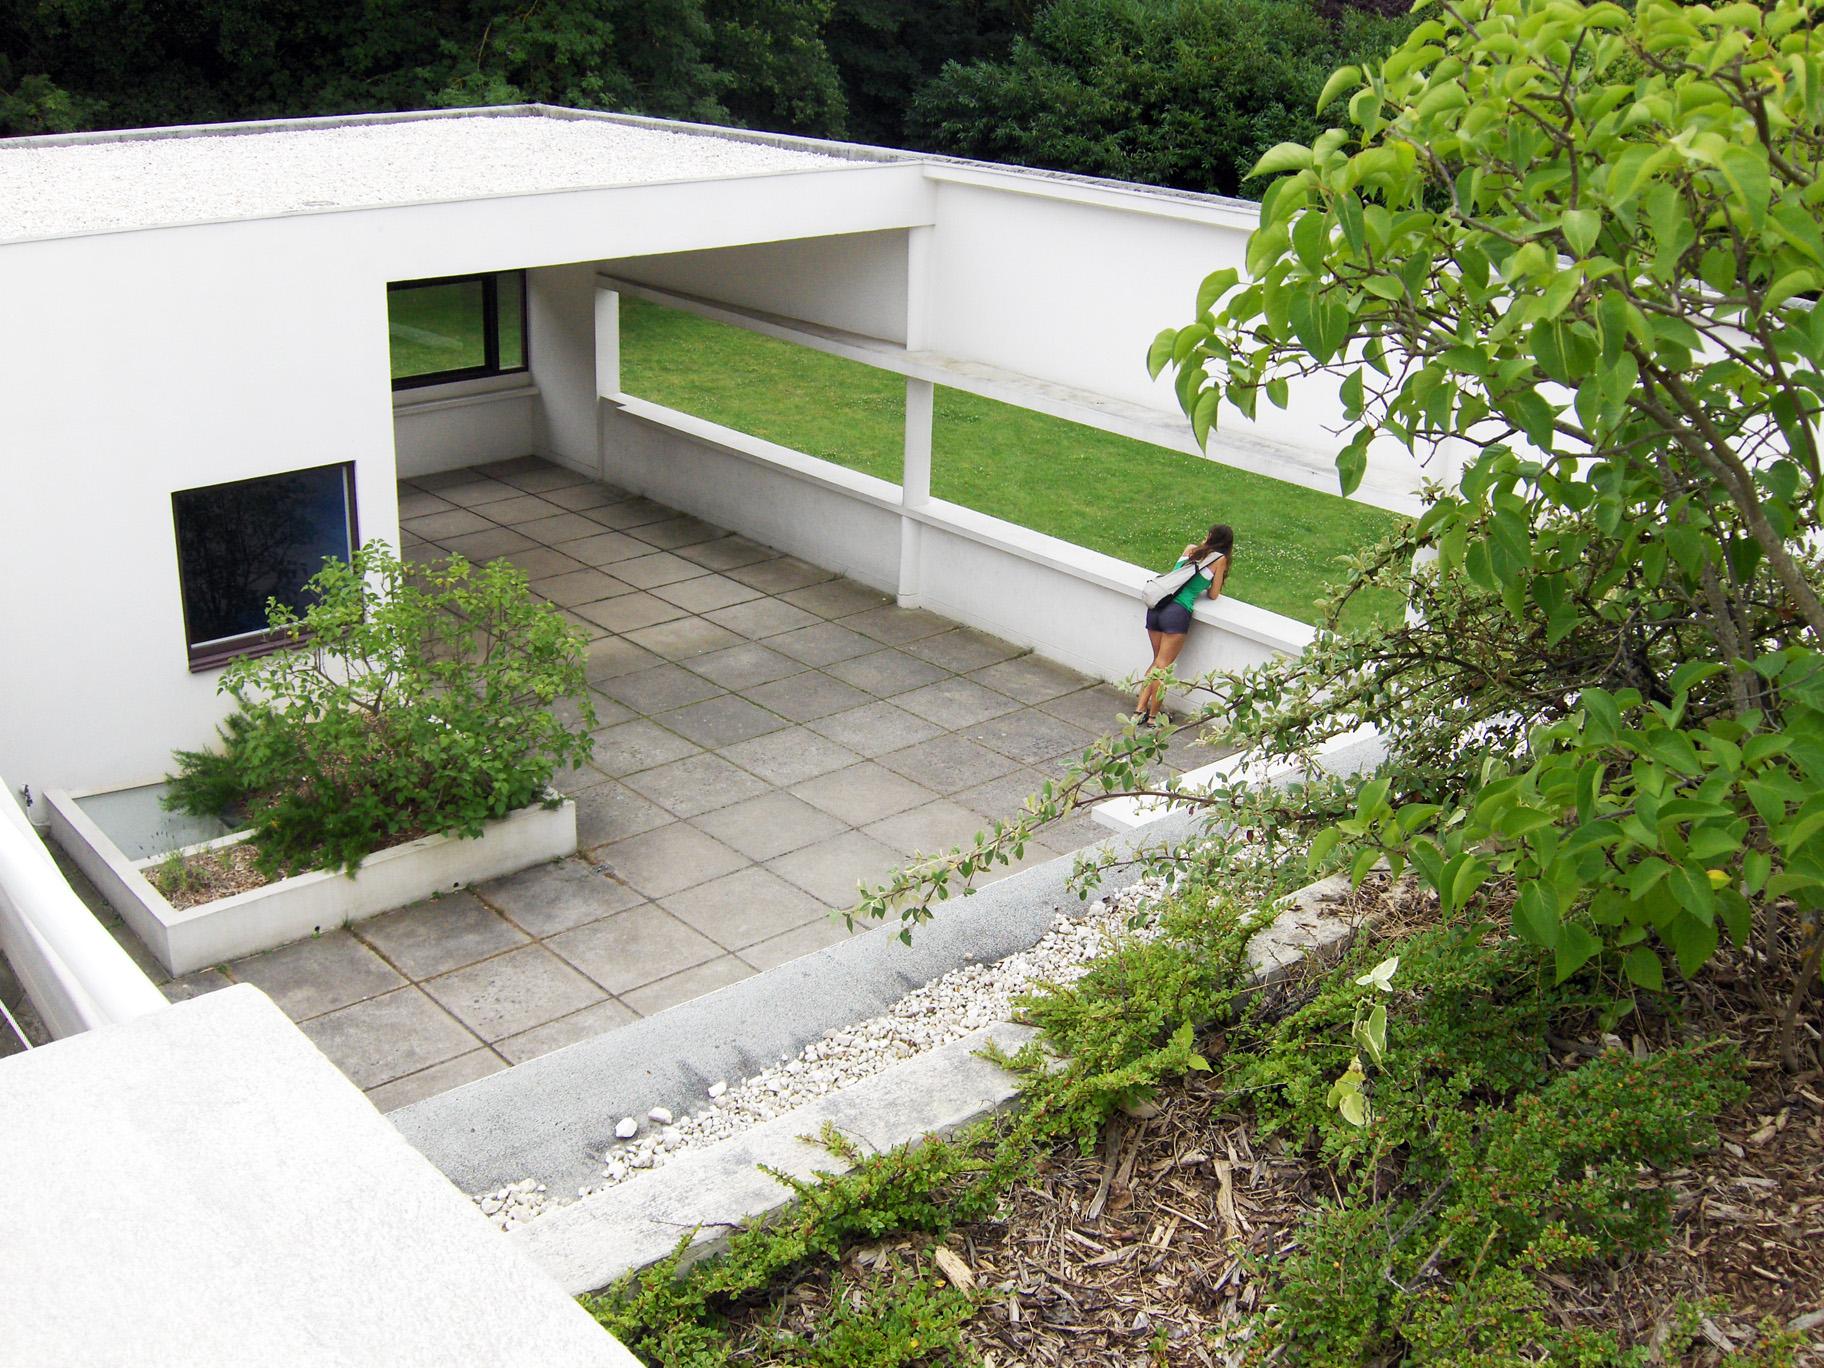 Terrasse Villa Savoye : Villa Savoye, roof terrace Flickr Photo Sharing!